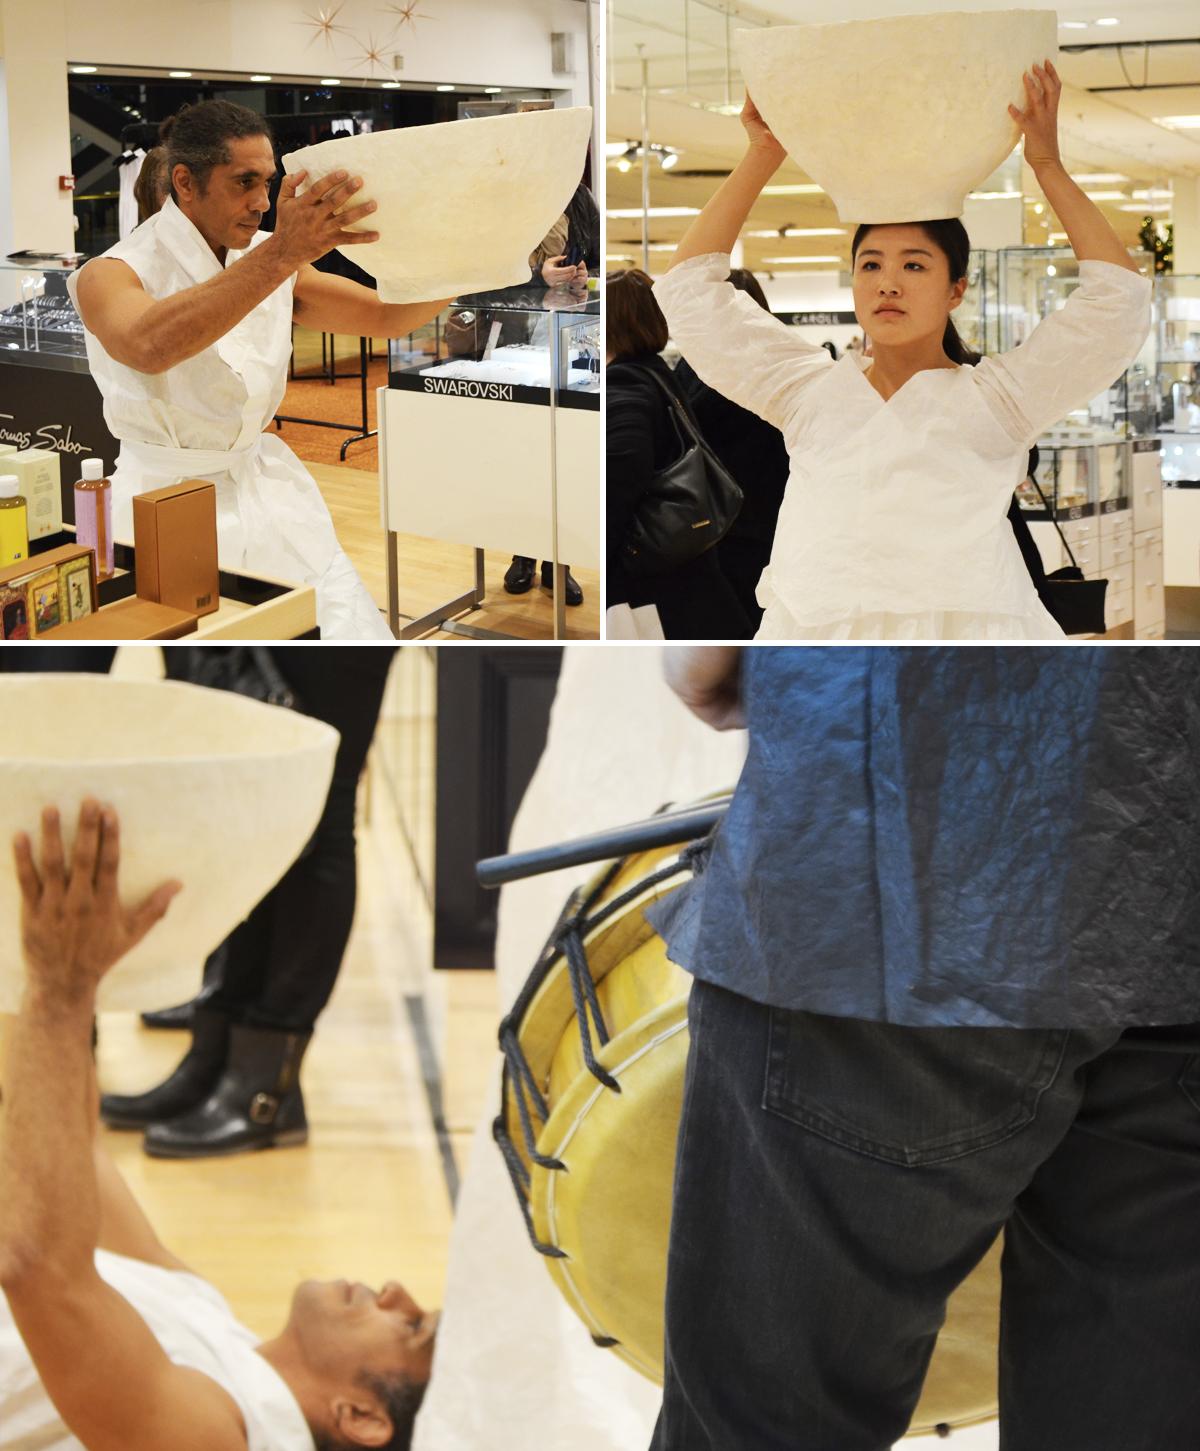 too-cool-for-school-galeries-lafayette-montpellier-danse-coreenne